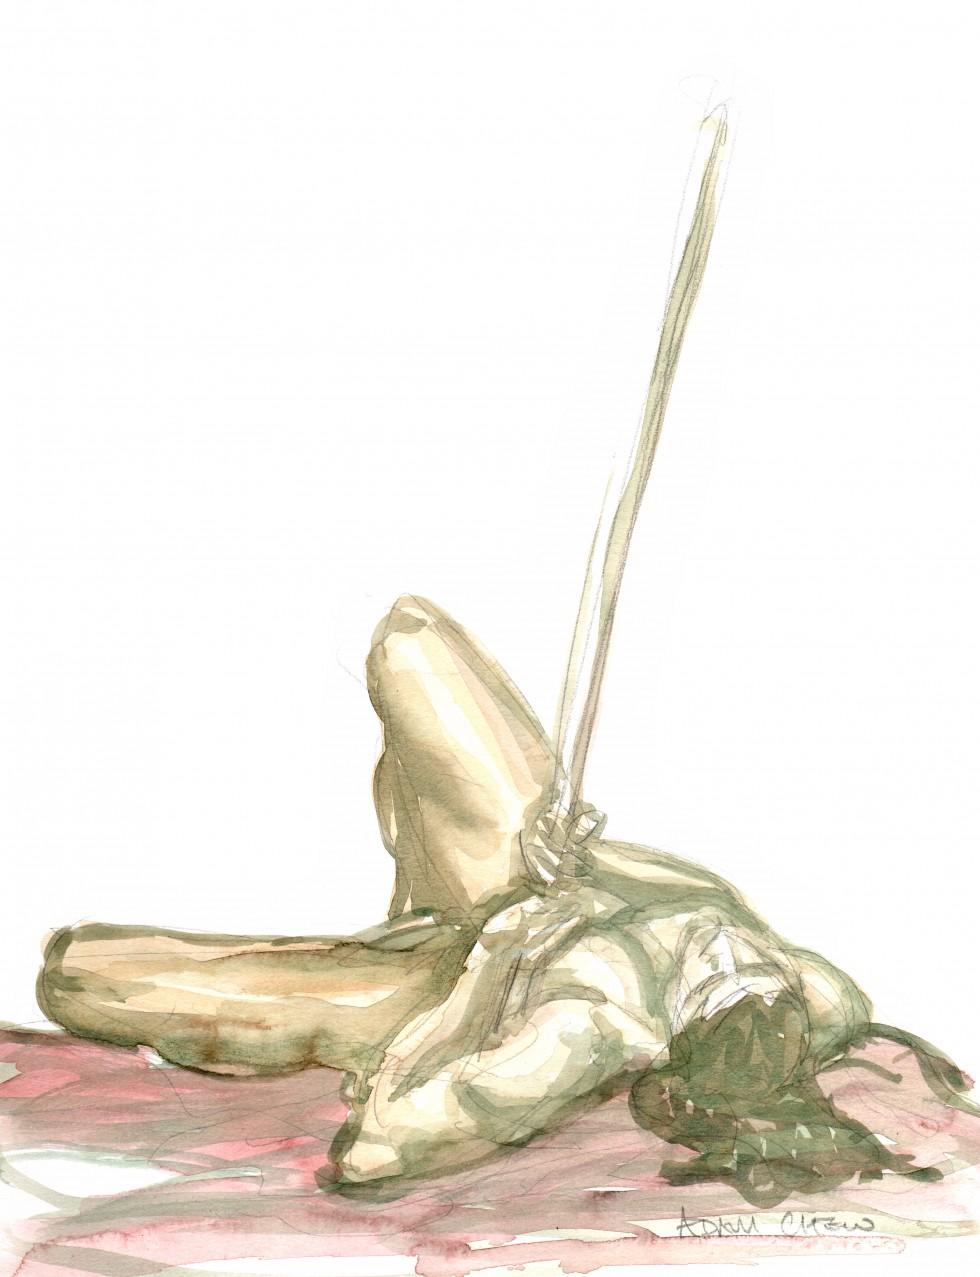 Slain - Adam Chew, 2014